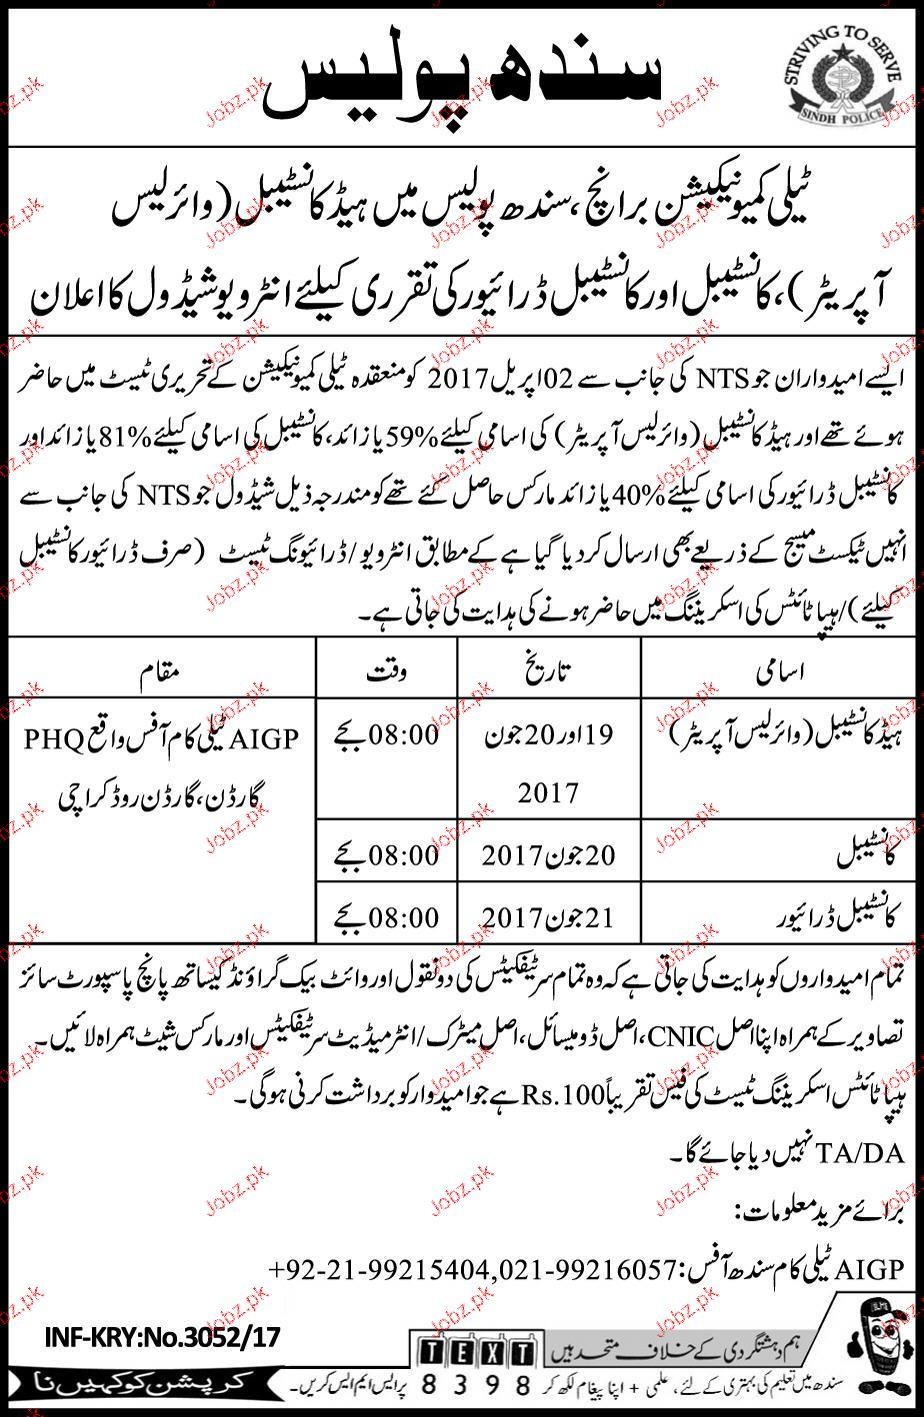 Sindh Police Recruitment of Constable Through NTS